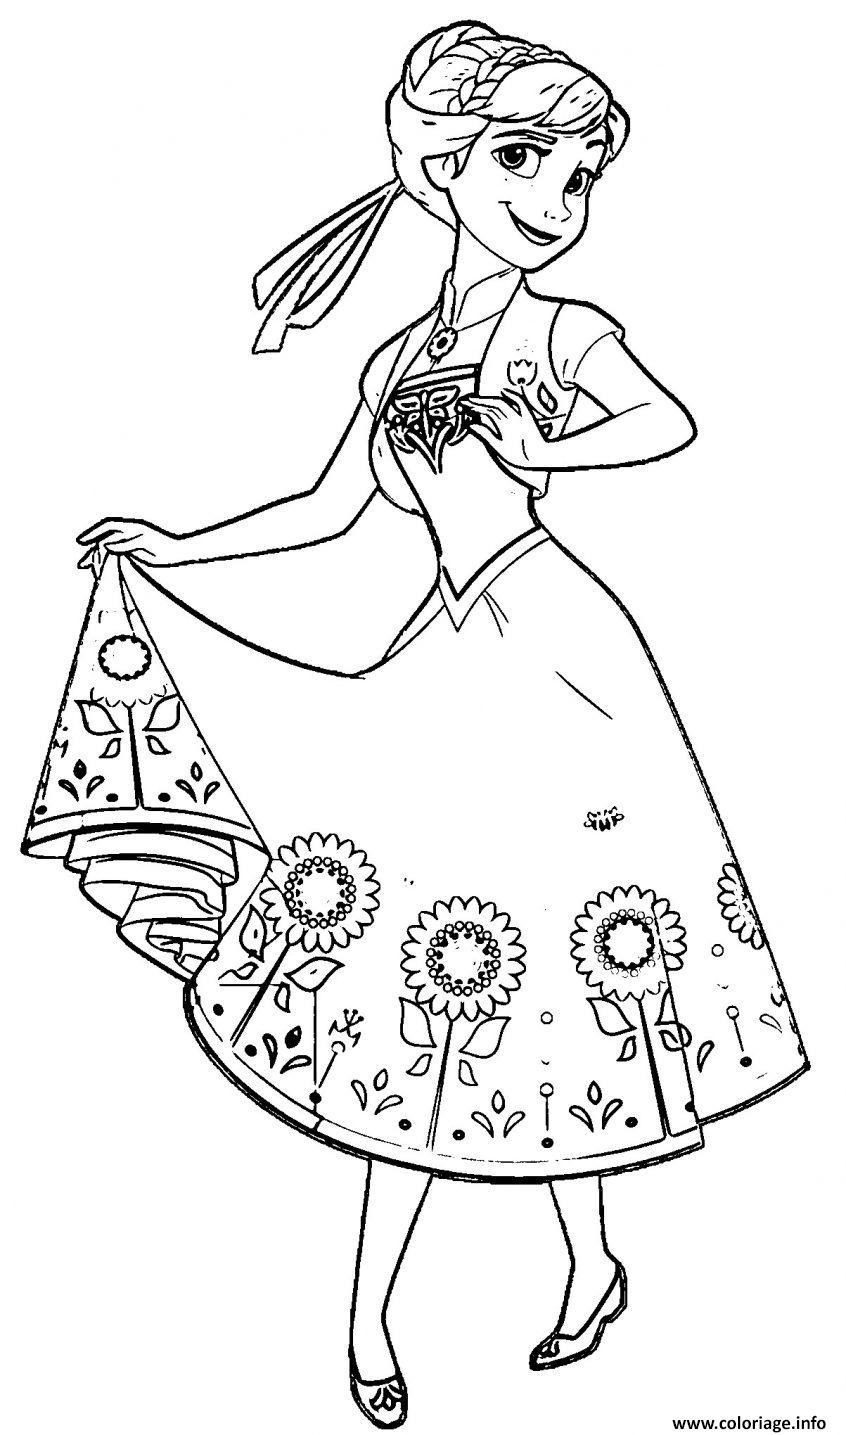 Coloriage Princesse Anna D Arendelle Disney 2013 Dessin Princesse à imprimer